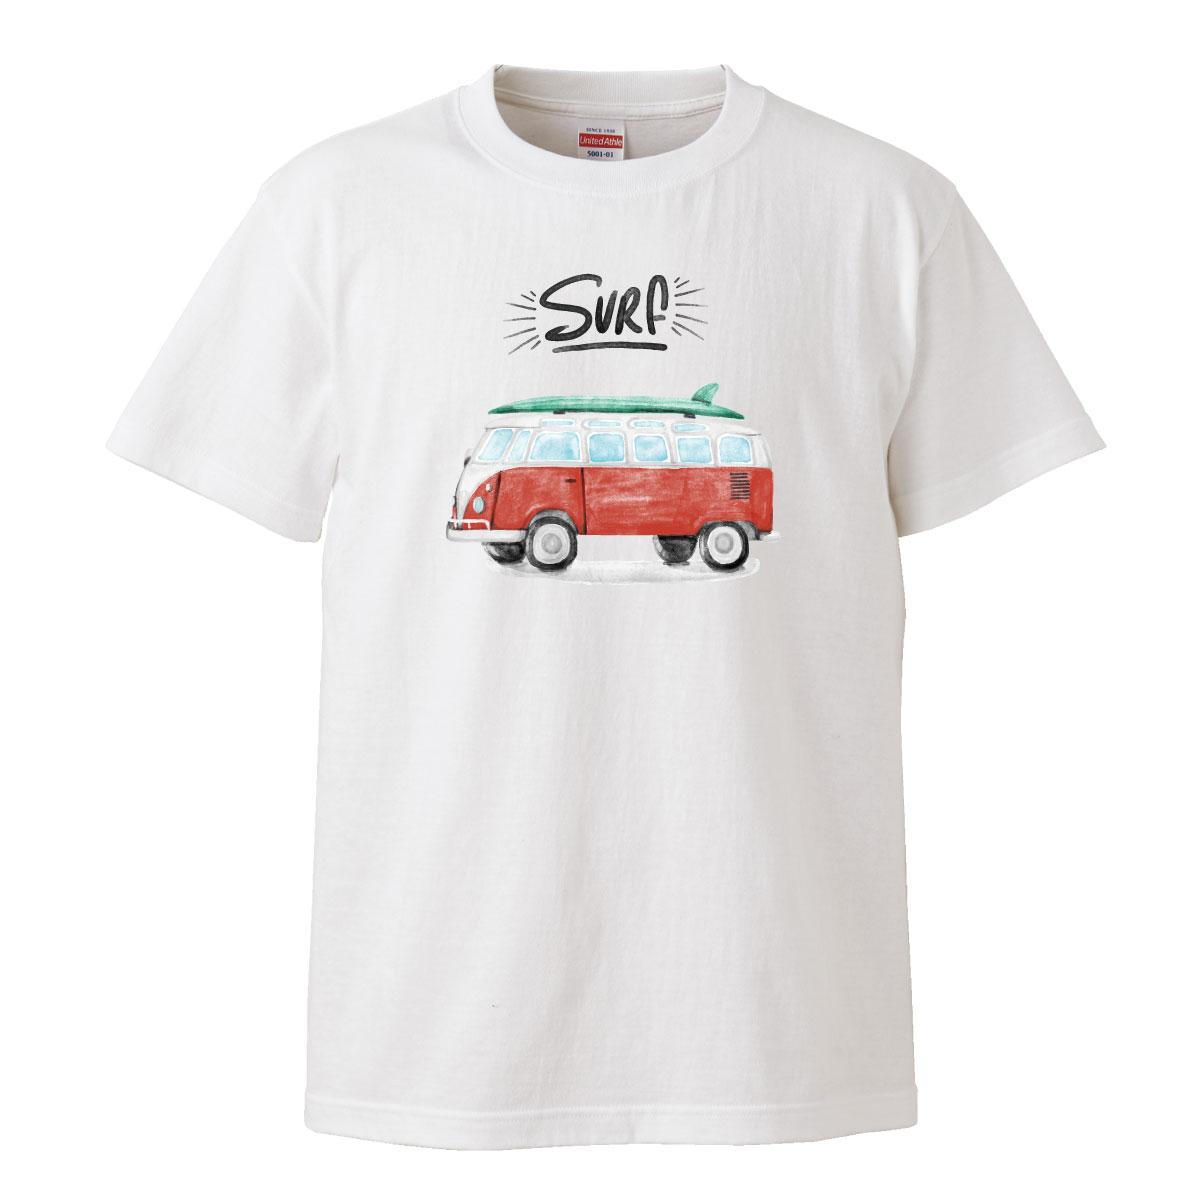 Tシャツ プリント brandnew スポーツ...の紹介画像3